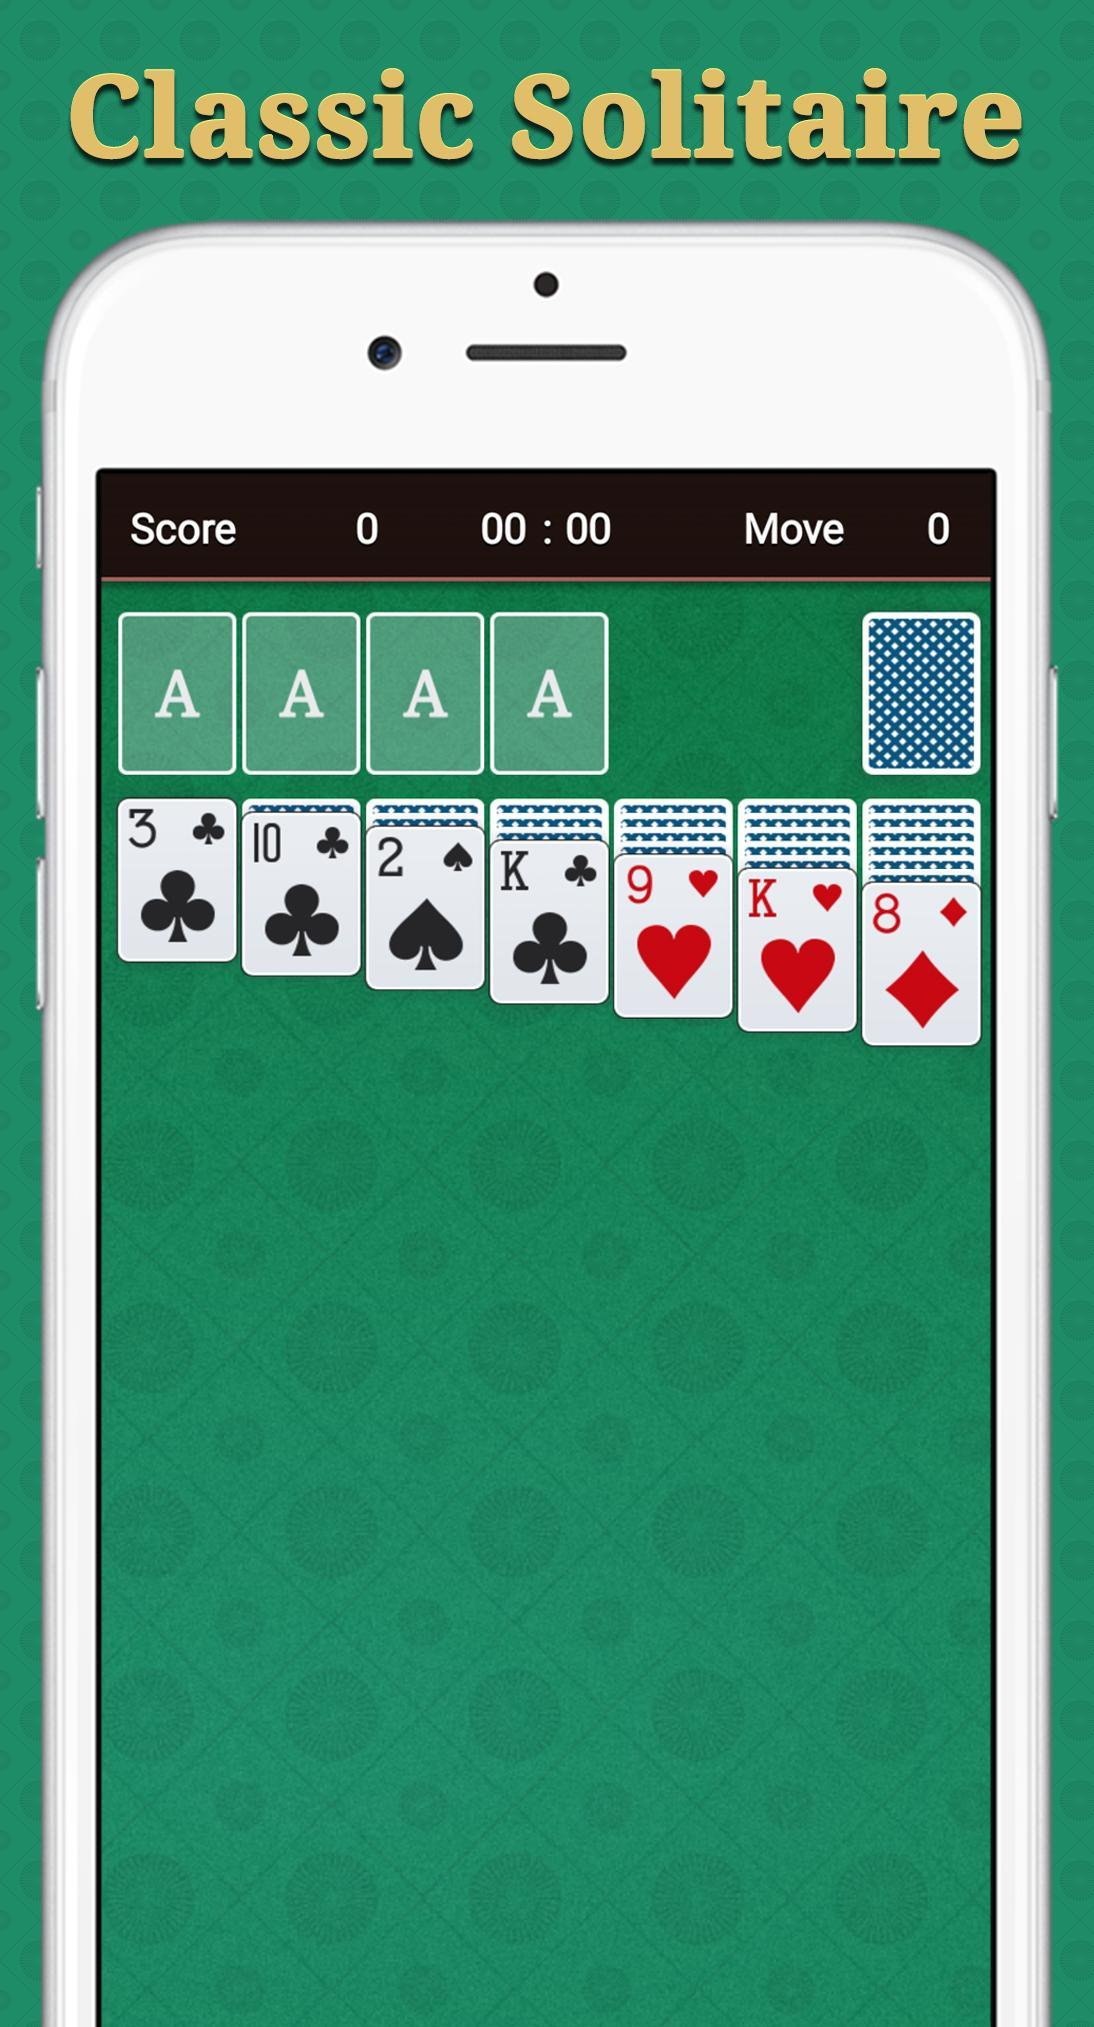 Solitaire 1.71 Screenshot 1